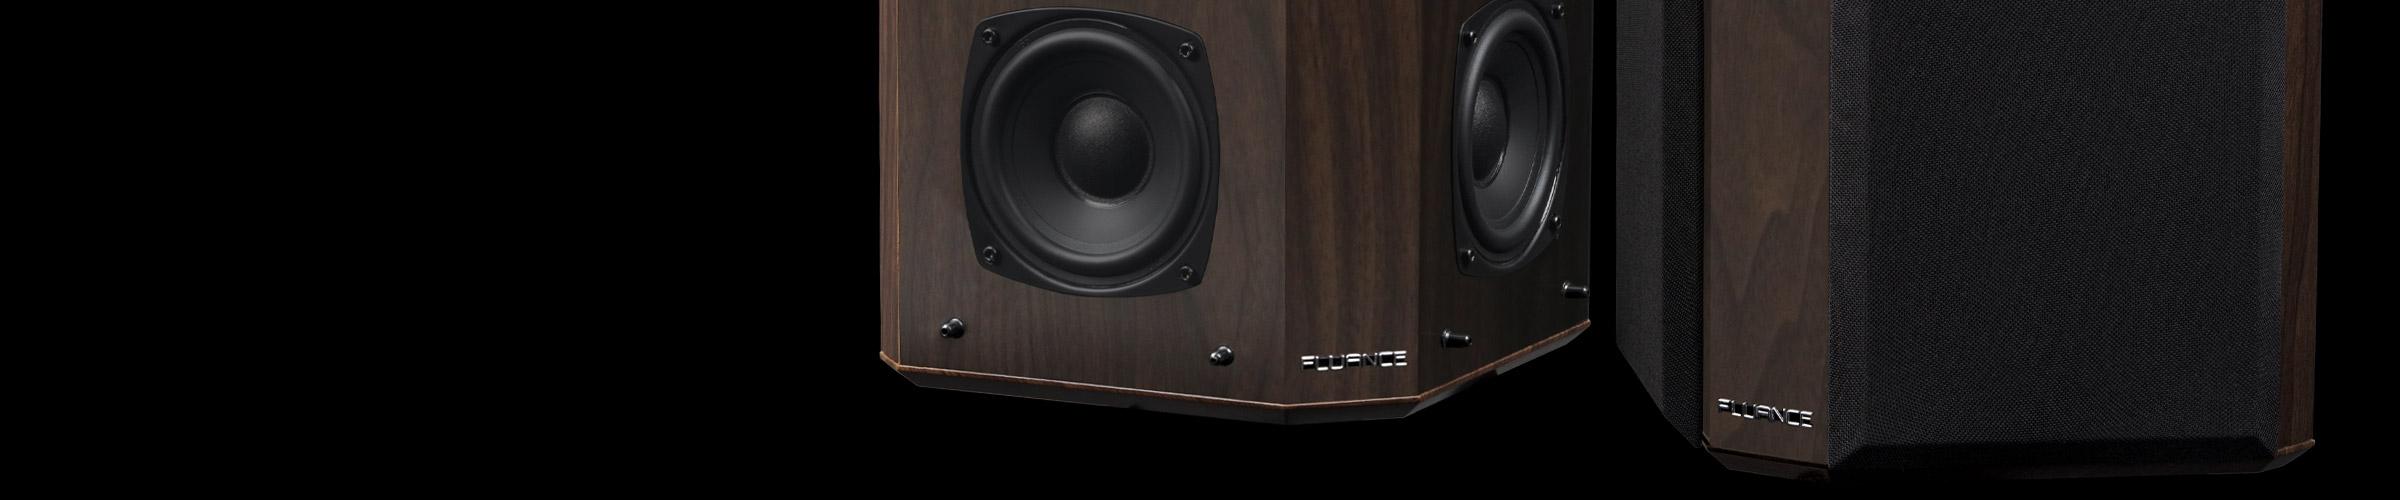 SXBP2 Bipolar Surround Sound Speakers Intro